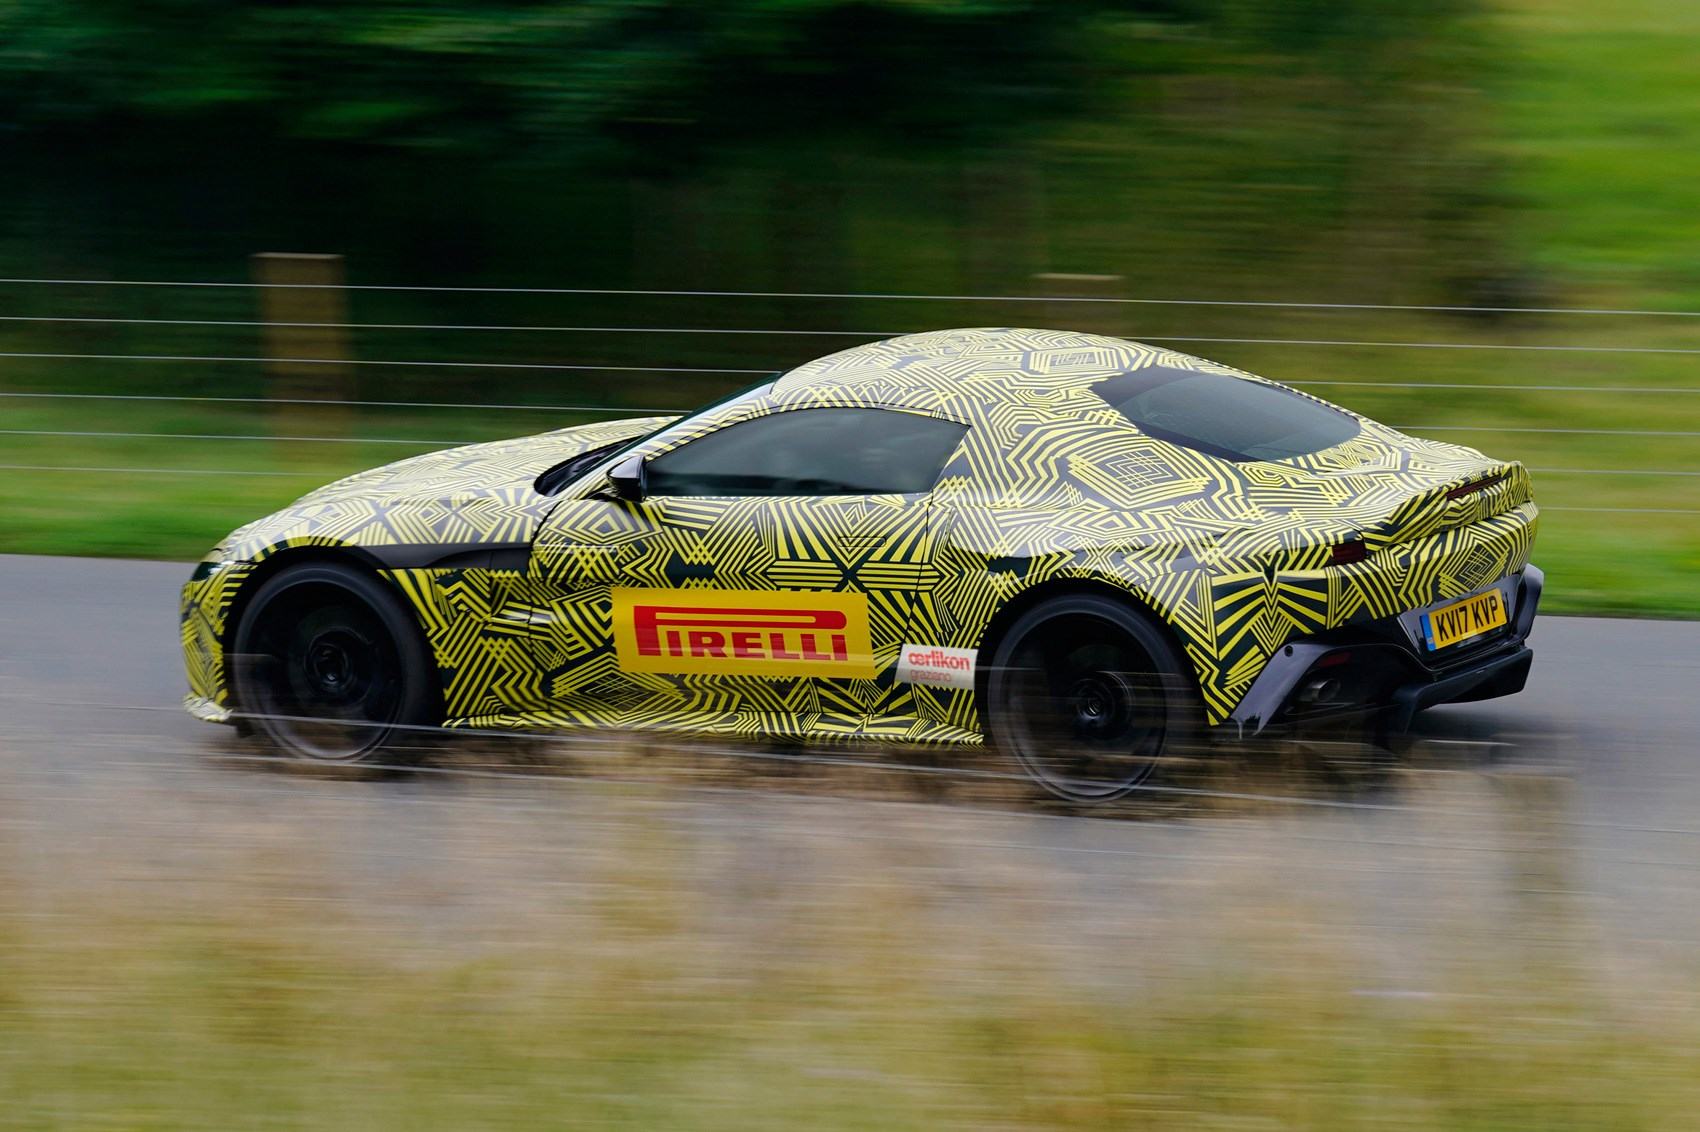 New Aston Martin Vantage Pics Specs Prices CAR Magazine - Aston martin v8 vantage 2018